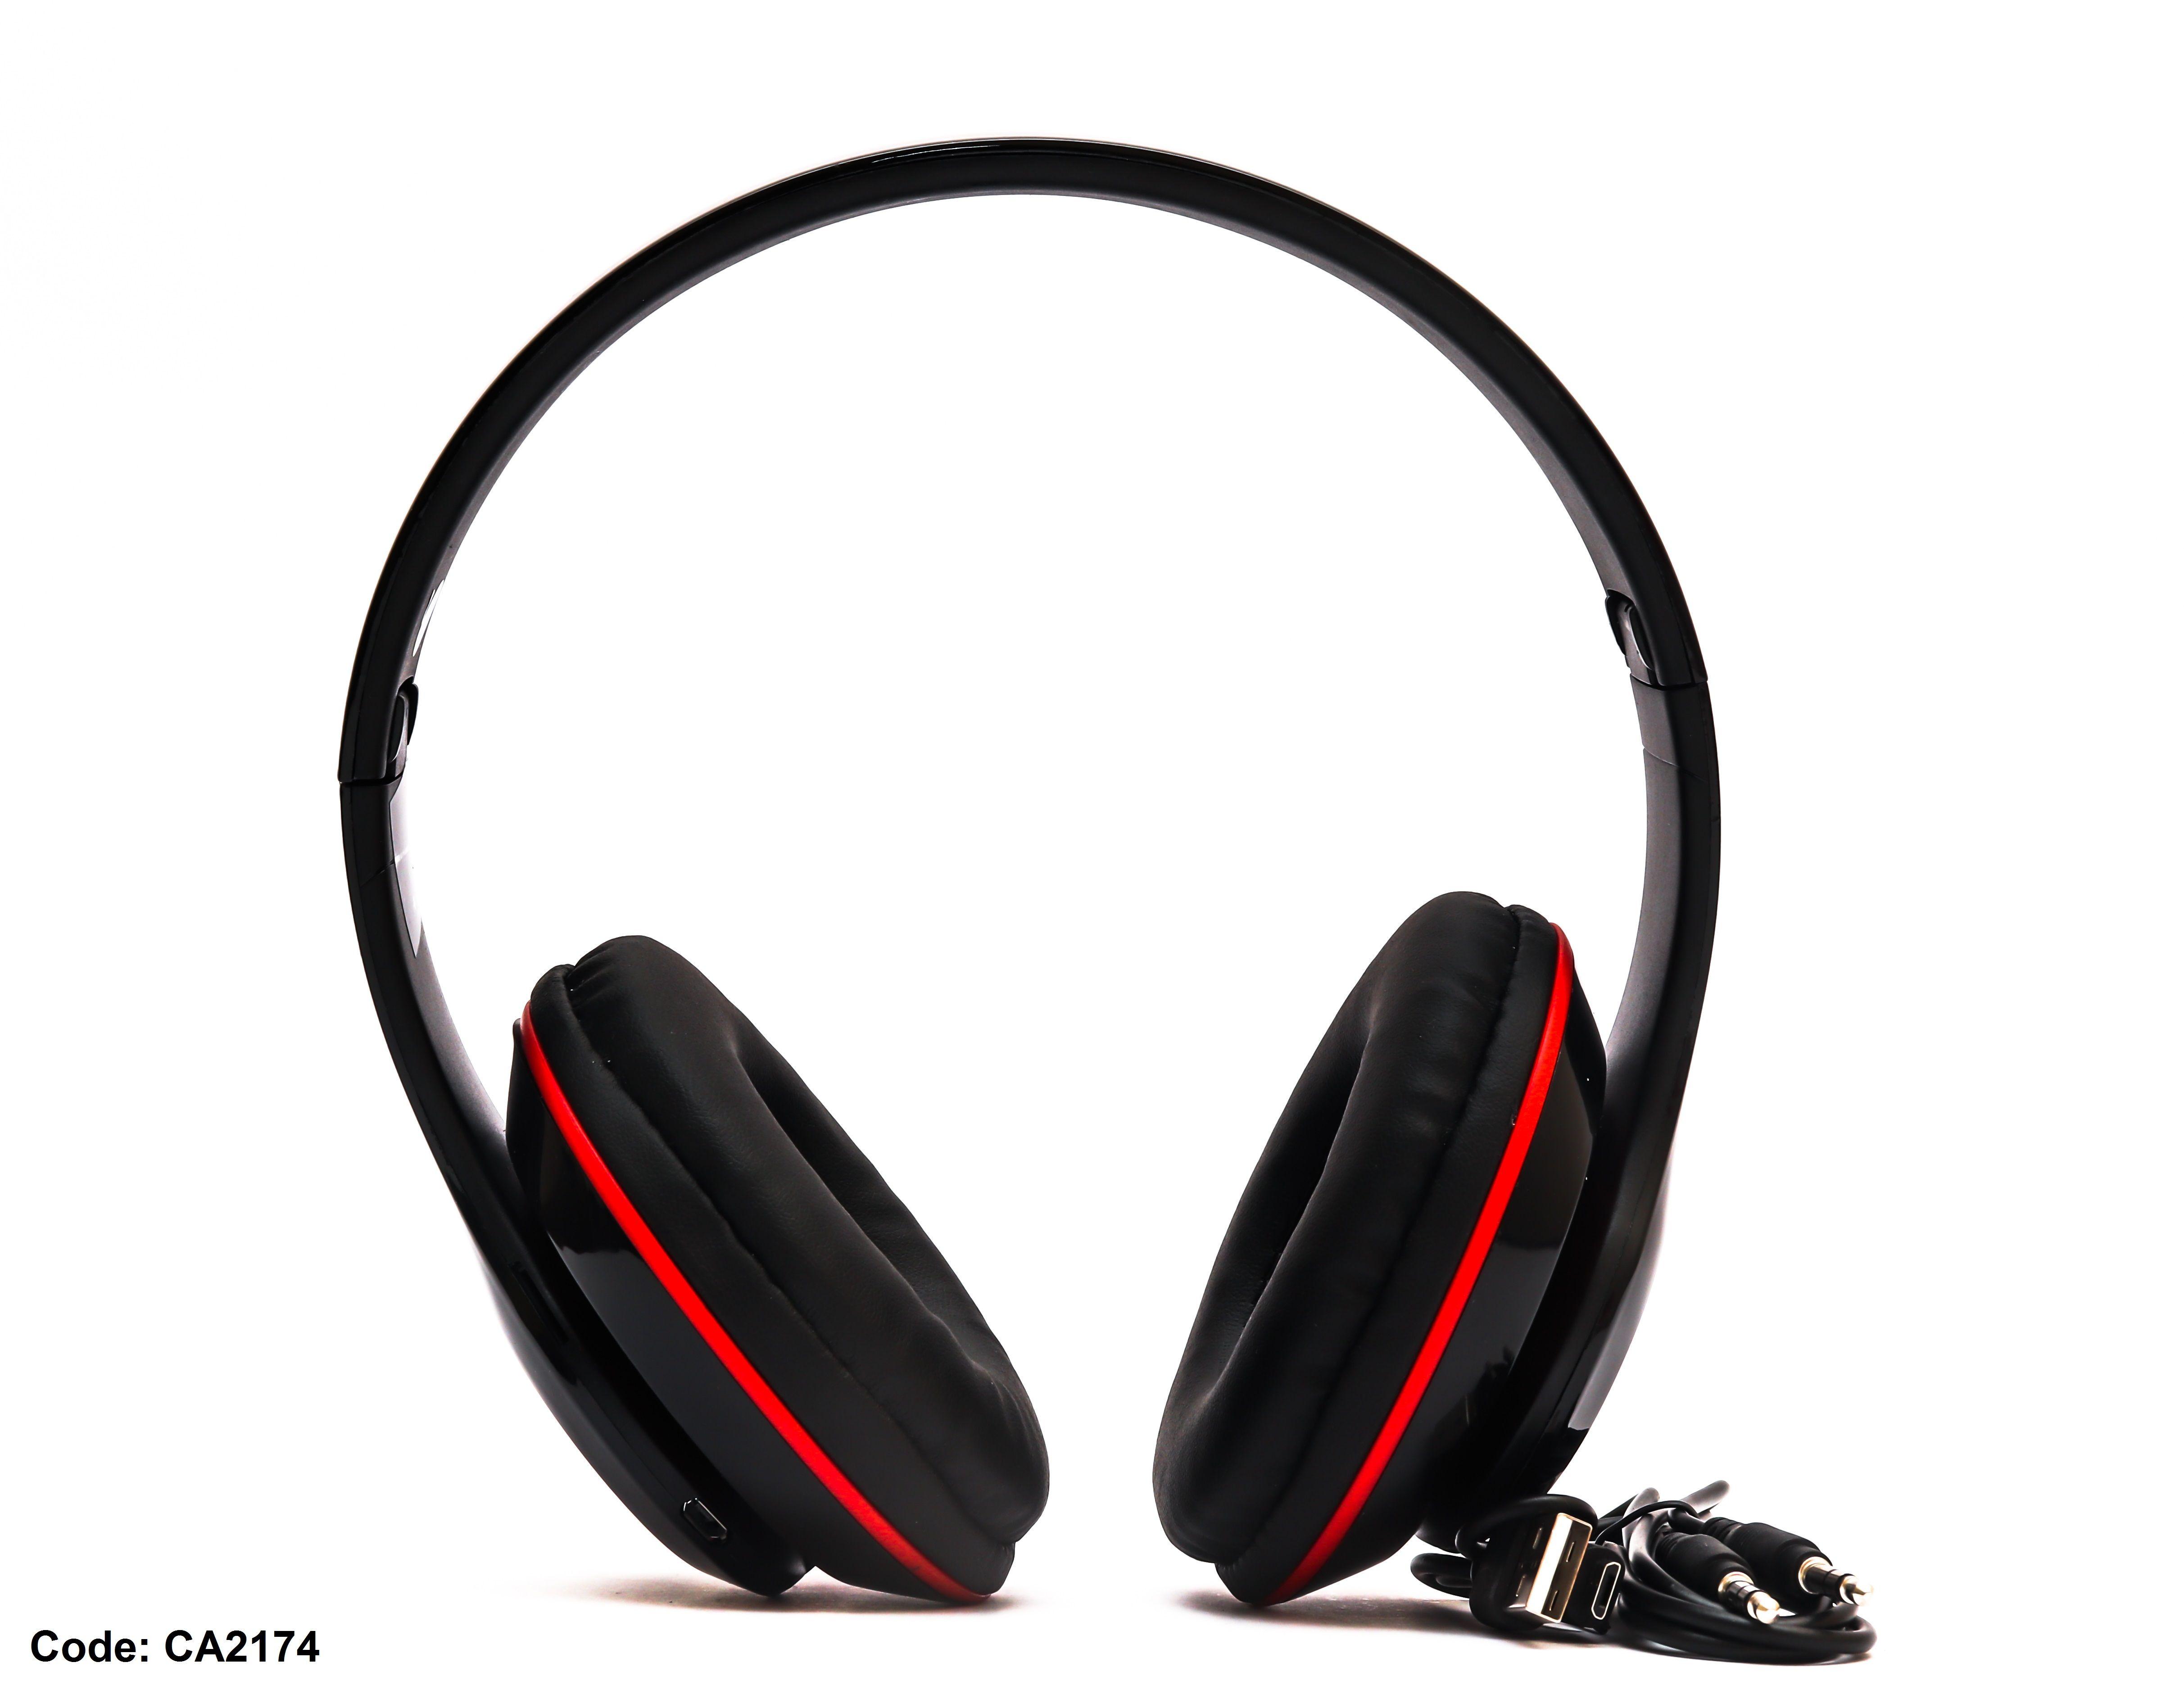 Headphones Beats 010 بسعر 170ج بدل من 280ج Phone Accessories Headphones Headset